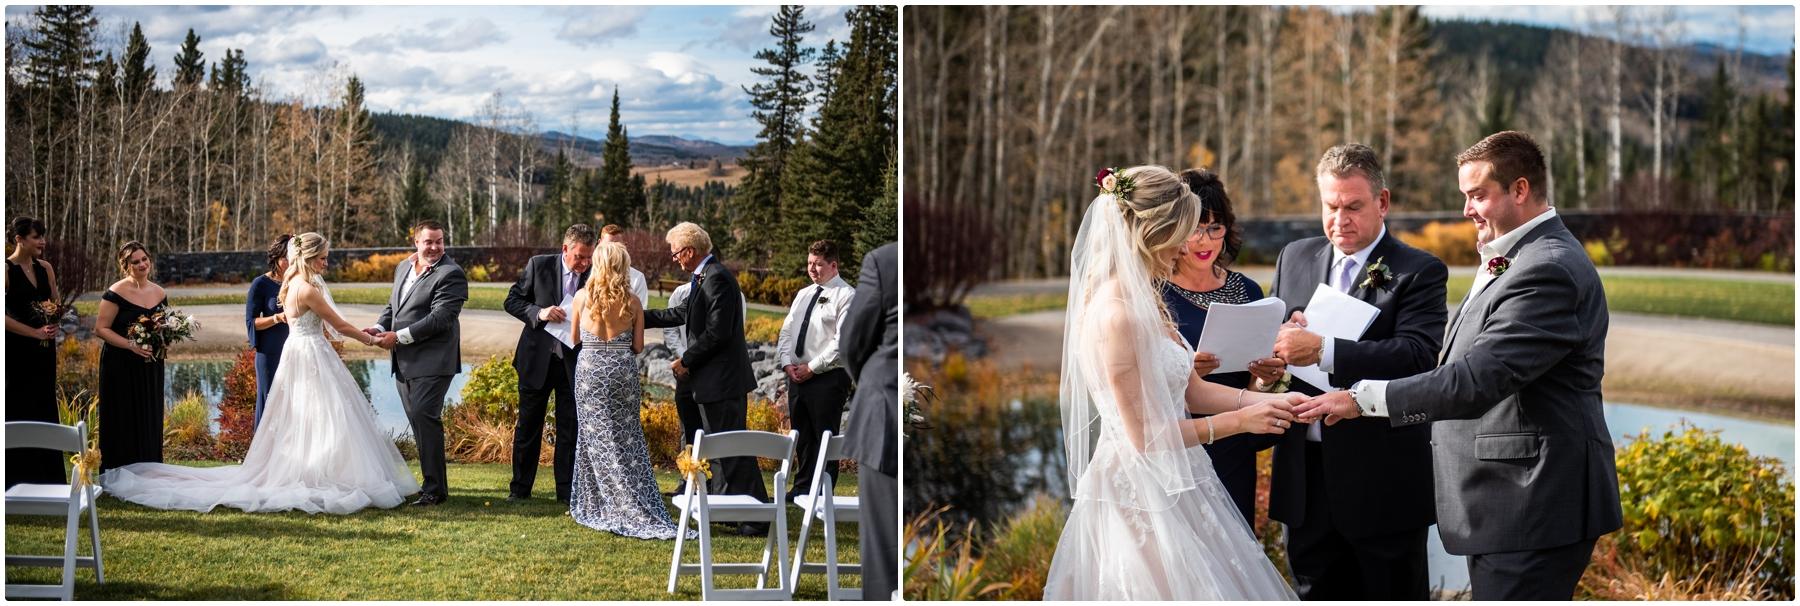 Autumn Azuridge Estate Hotel Wedding Outdoor Ceremony Photography